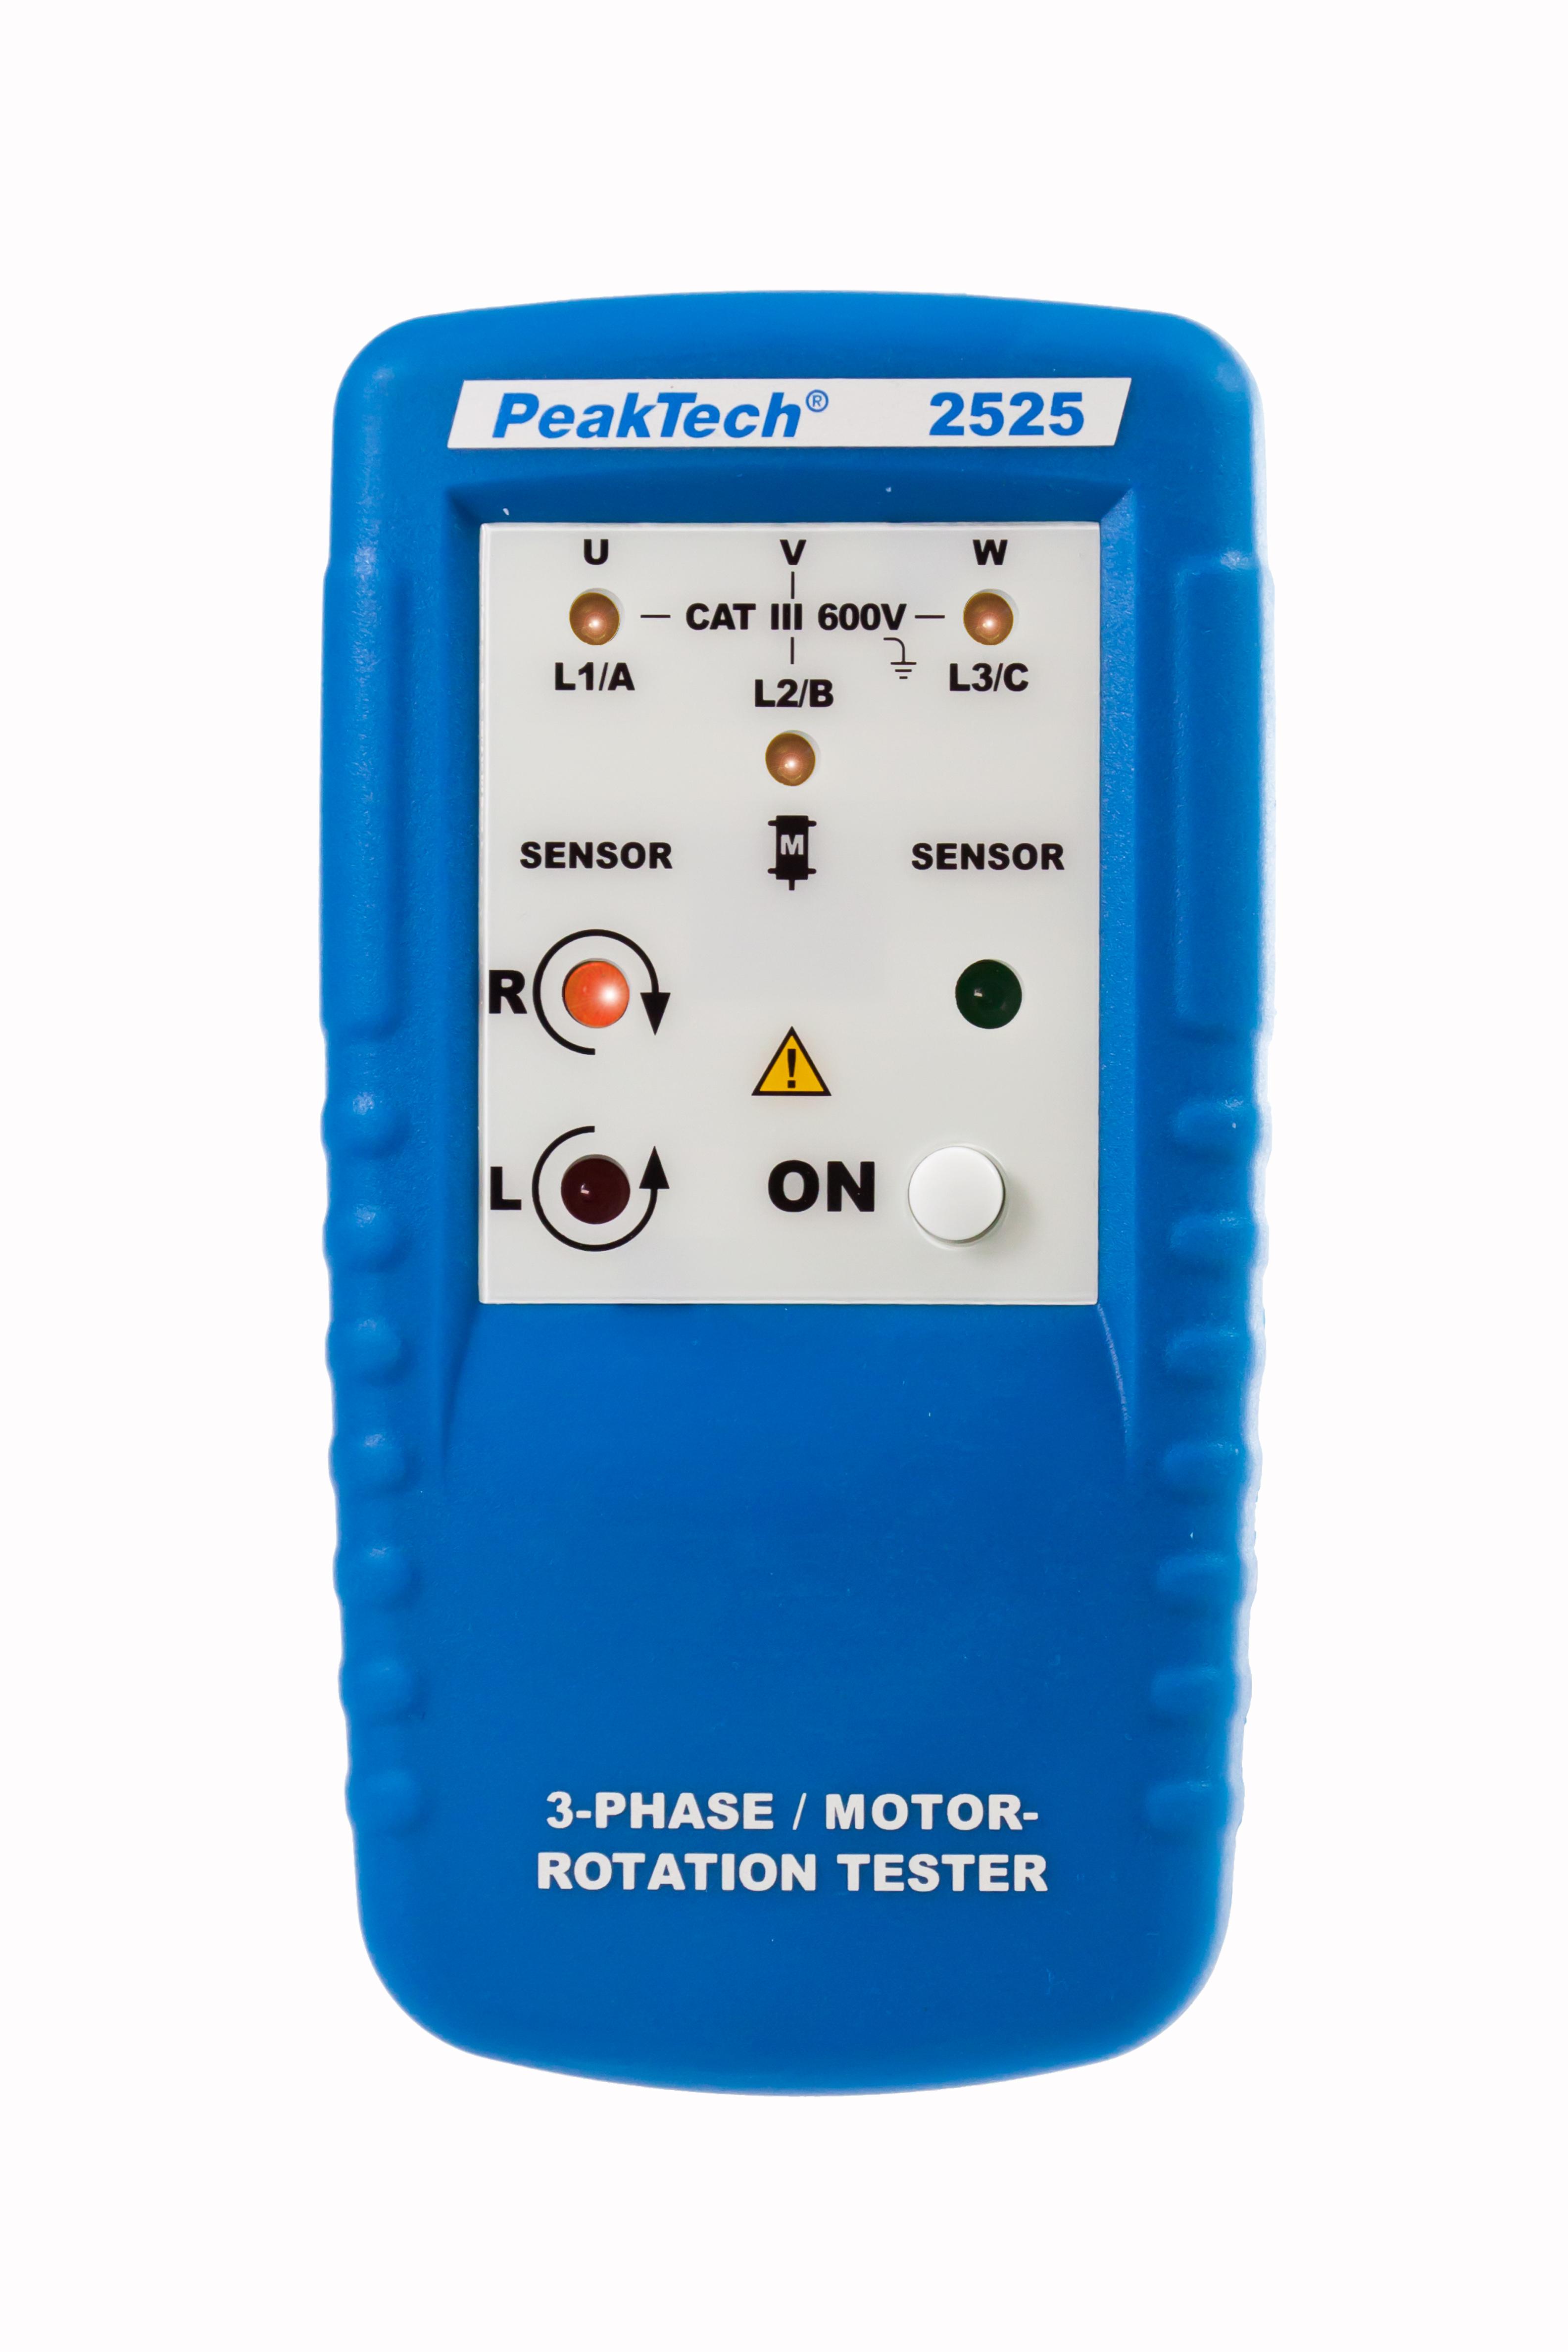 «PeakTech® P 2525» 3-phase motor direction indicator, LED display